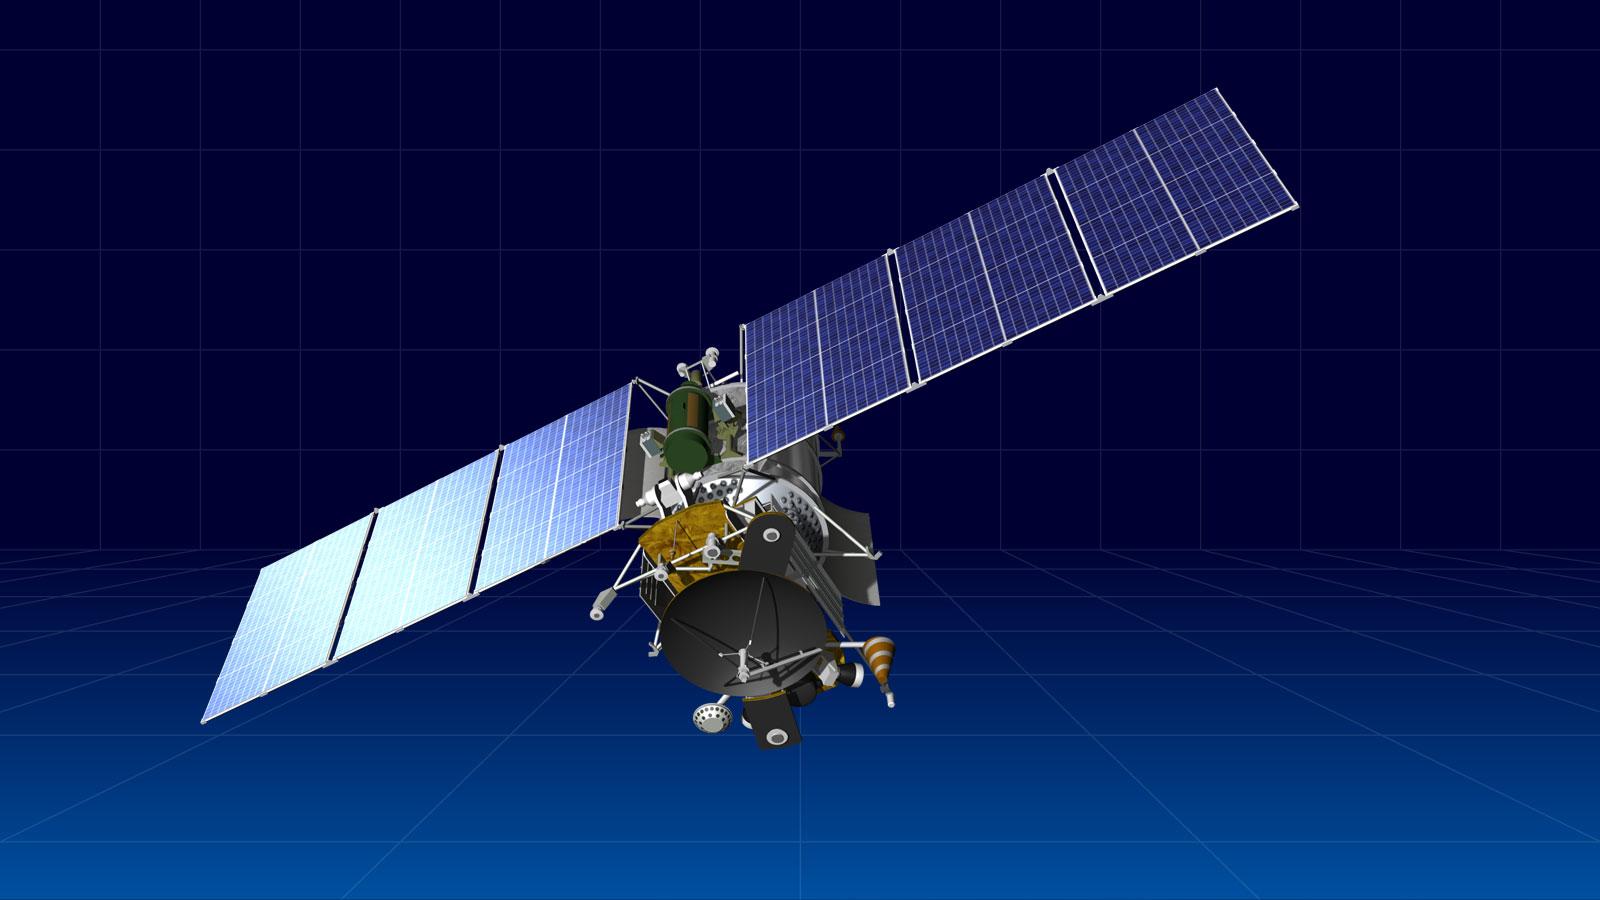 Artist's concept of a GEO-IK 2 satellite in orbit. Credit: ISS Reshetnev